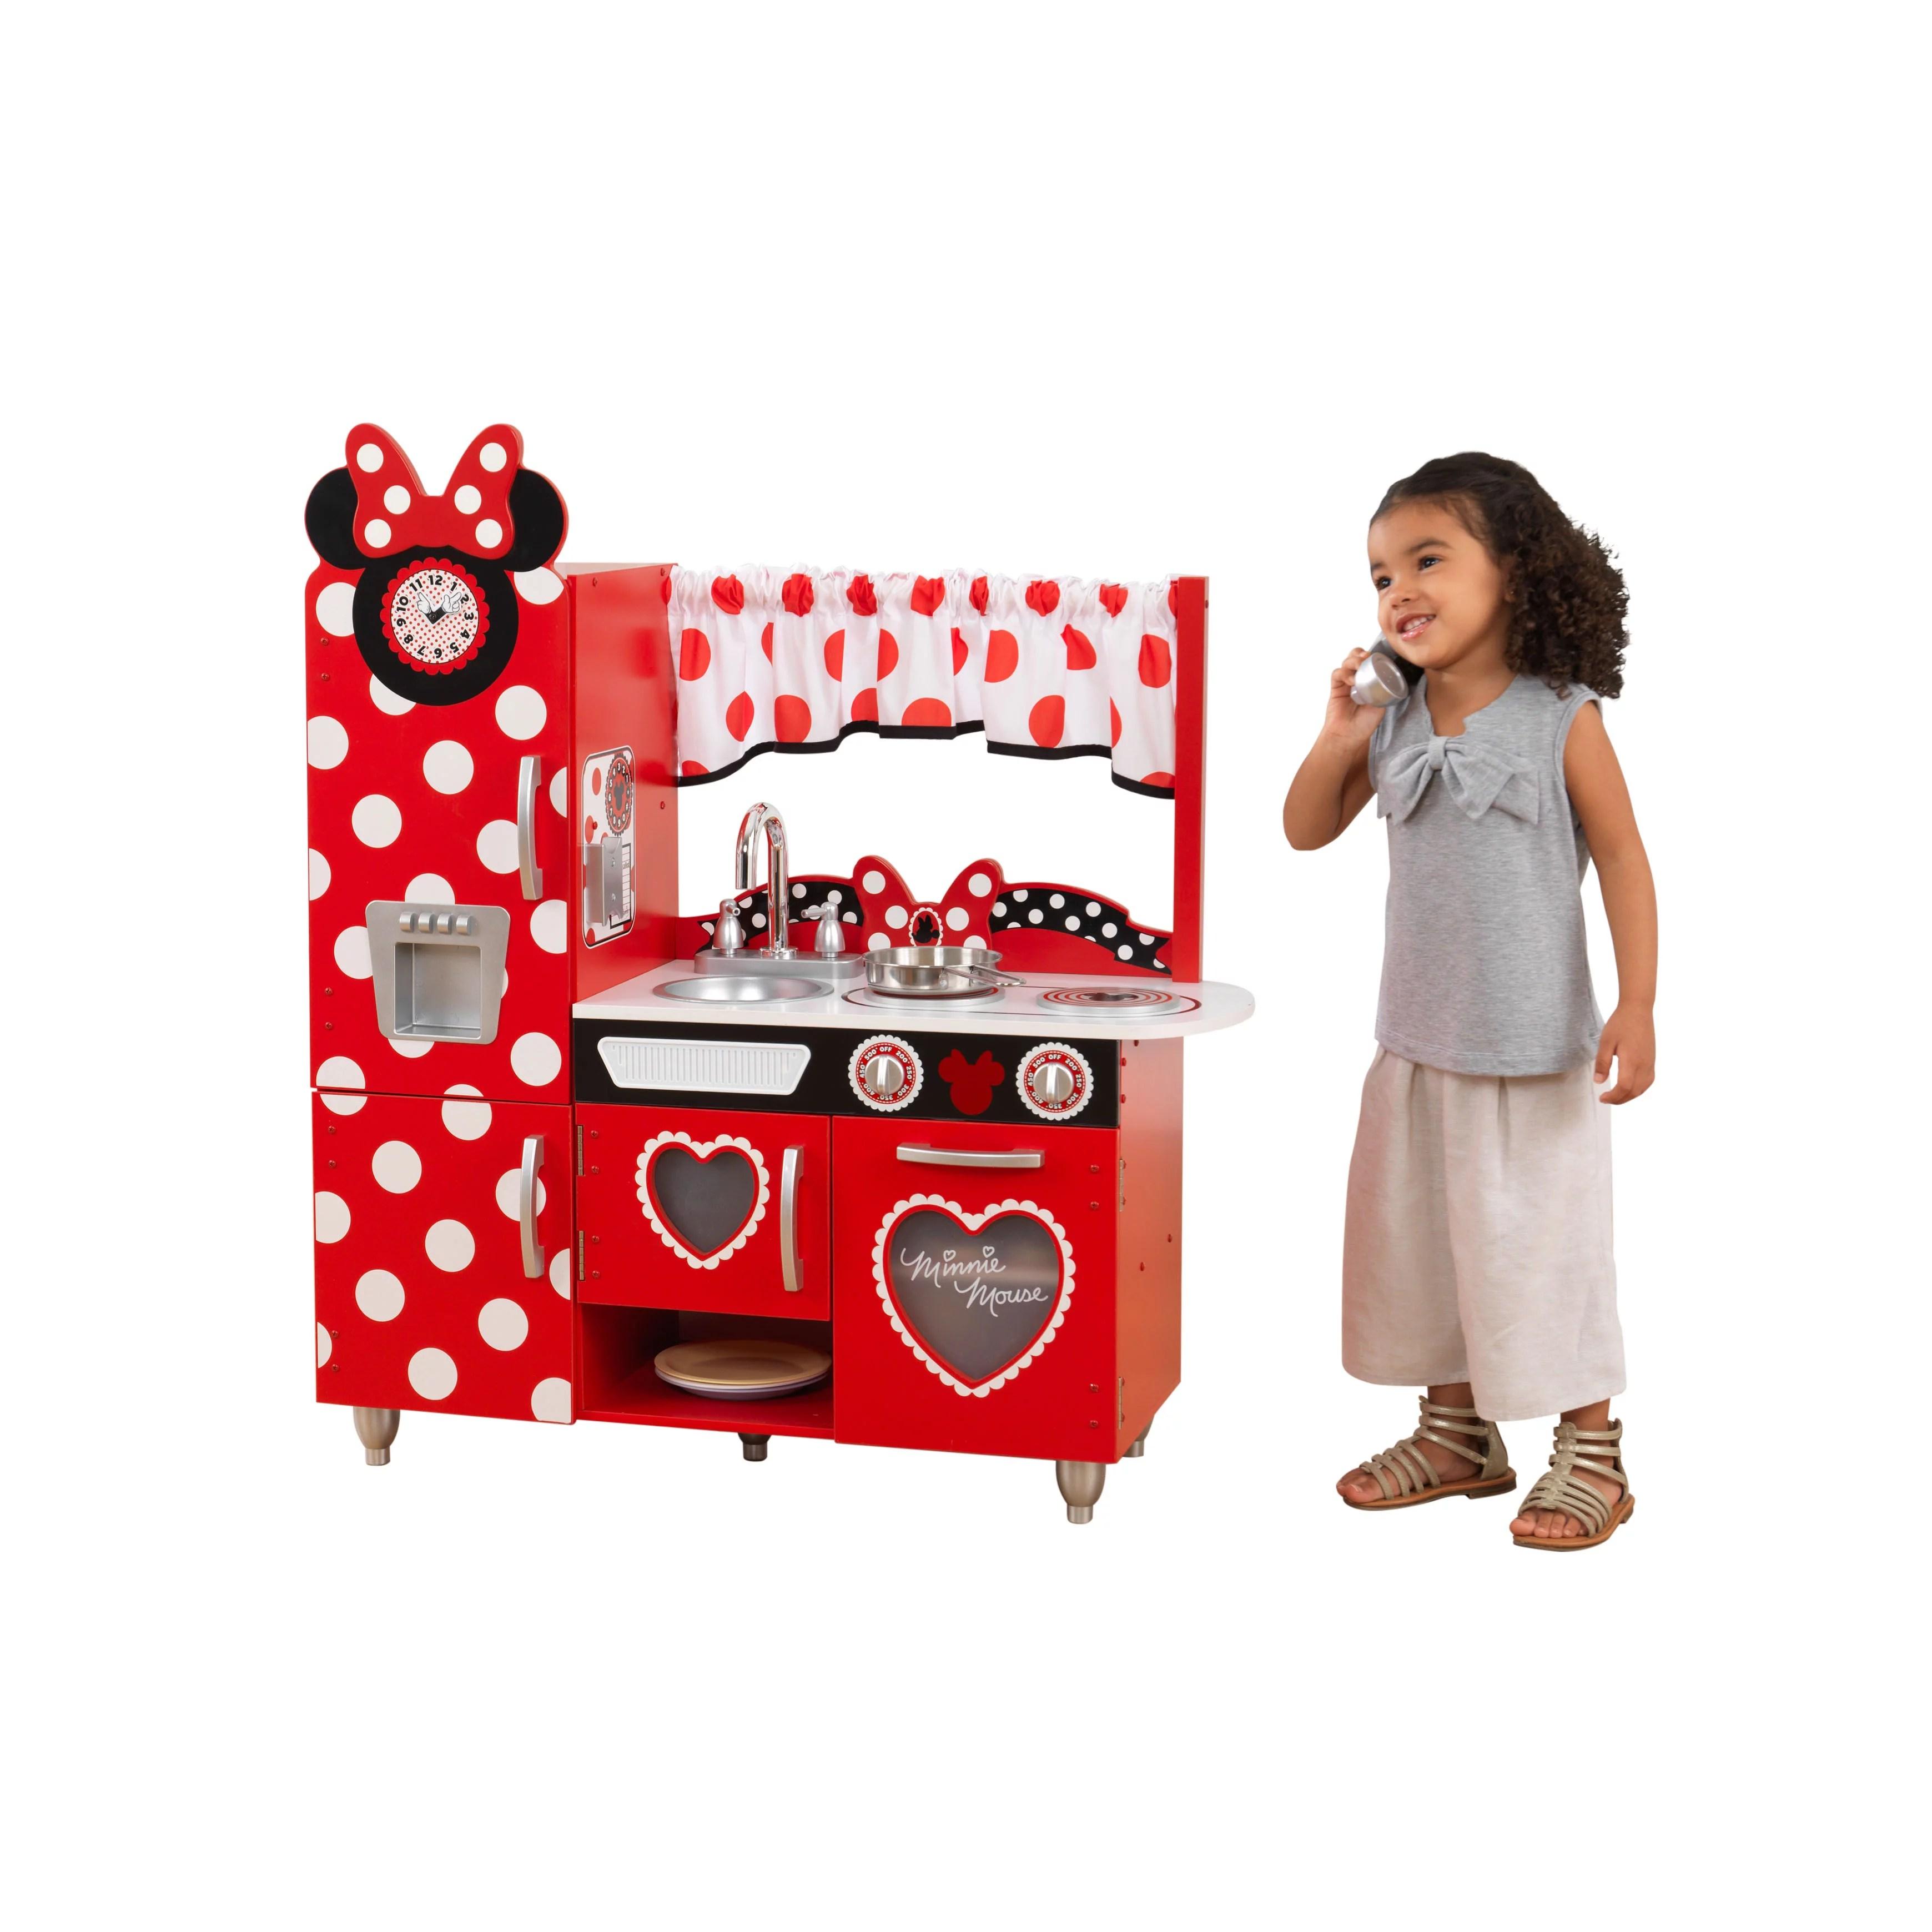 Disney Jr Minnie Mouse Vintage Play Kitchen By KidKraft